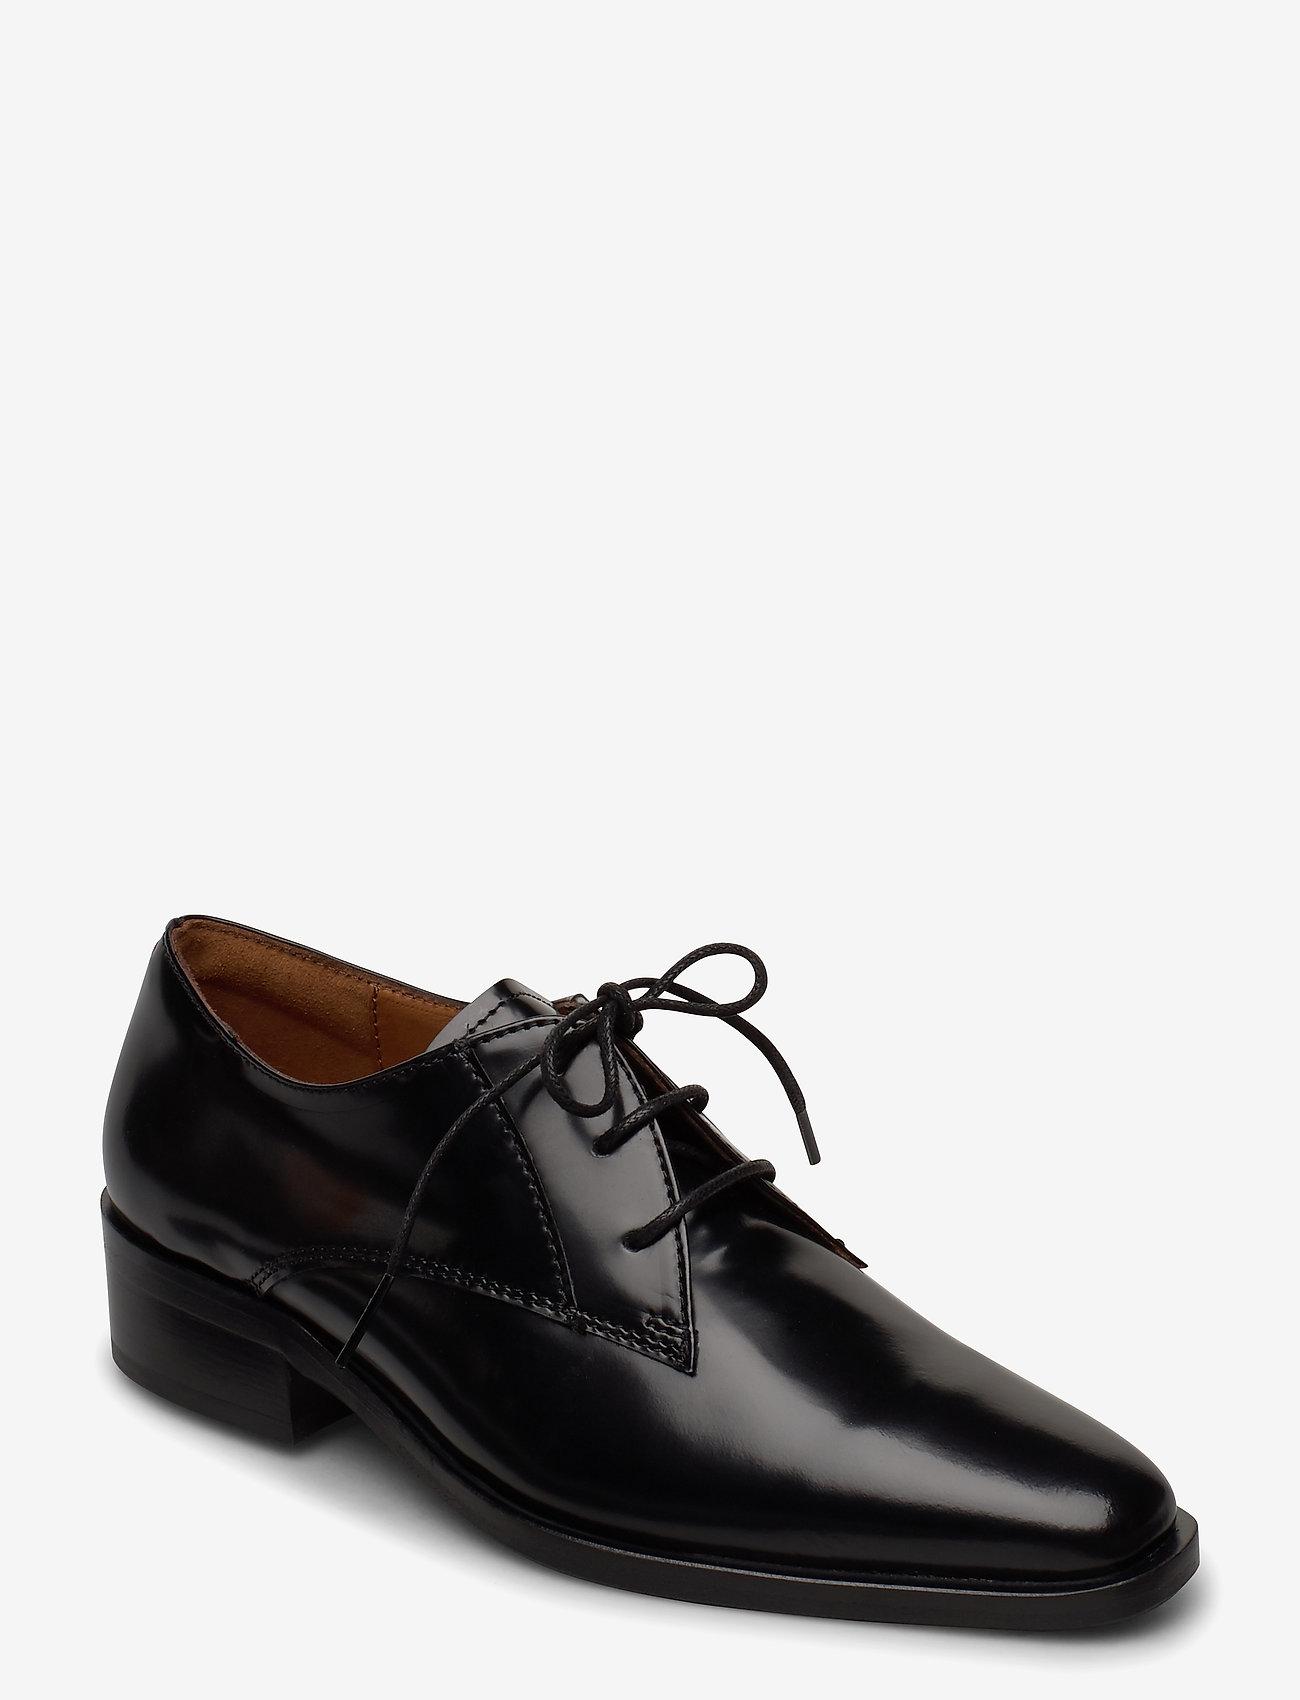 Billi Bi - Shoes 4700 - buty sznurowane - black polido  900 - 0